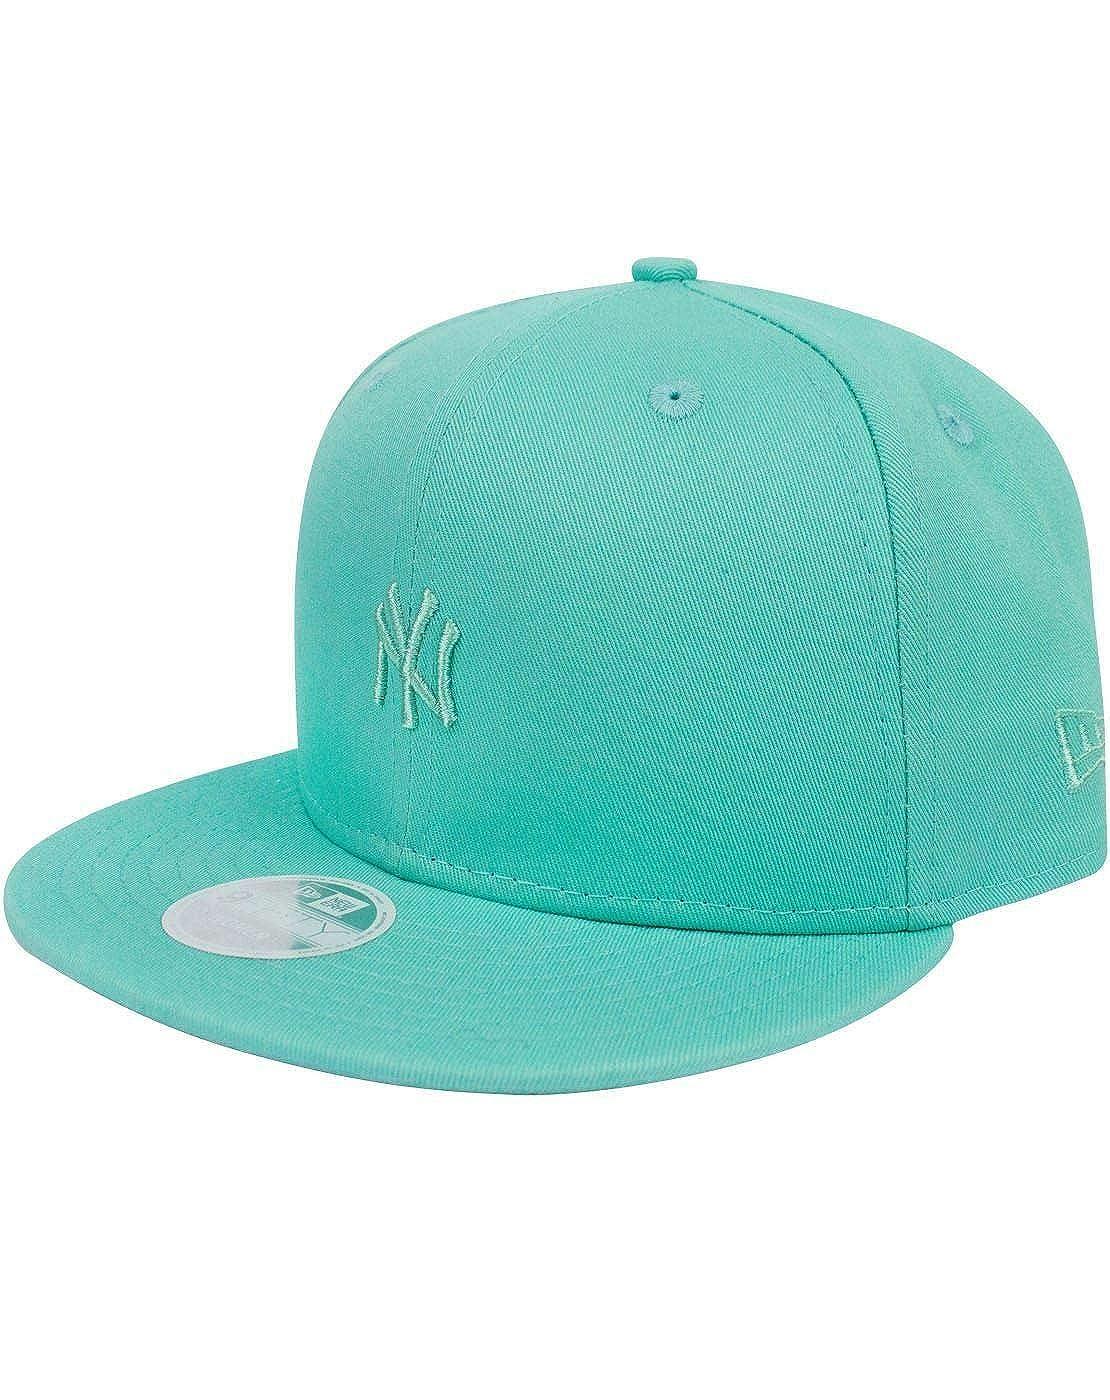 New Era 9Fifty MLB York Yankees Pastel Teal Womens Snapback Cap ...